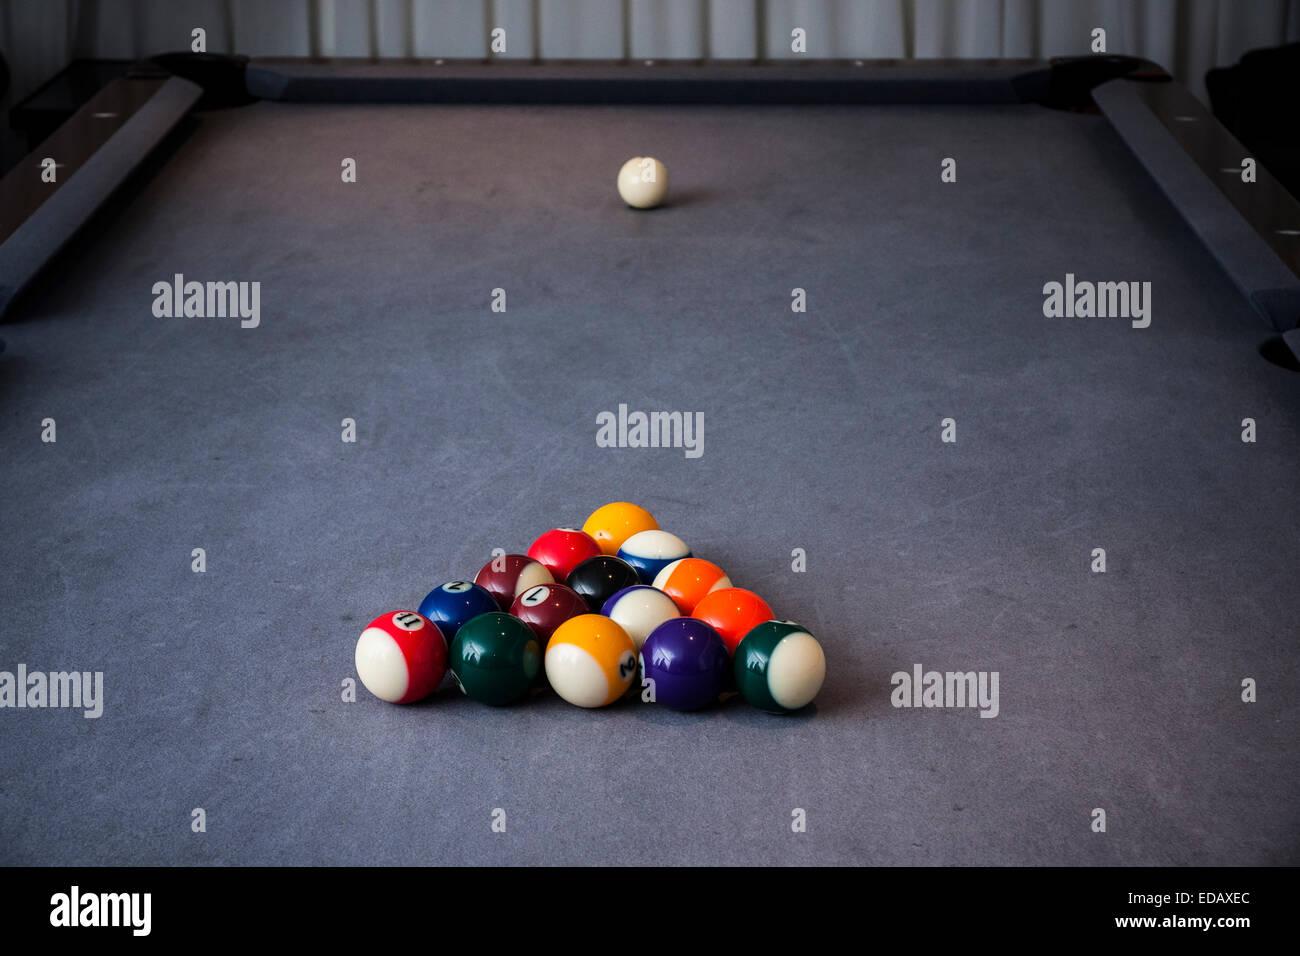 Setting Up A Pool Table Pool Table Setup Stock Photo Royalty Free Image 77072308 Alamy